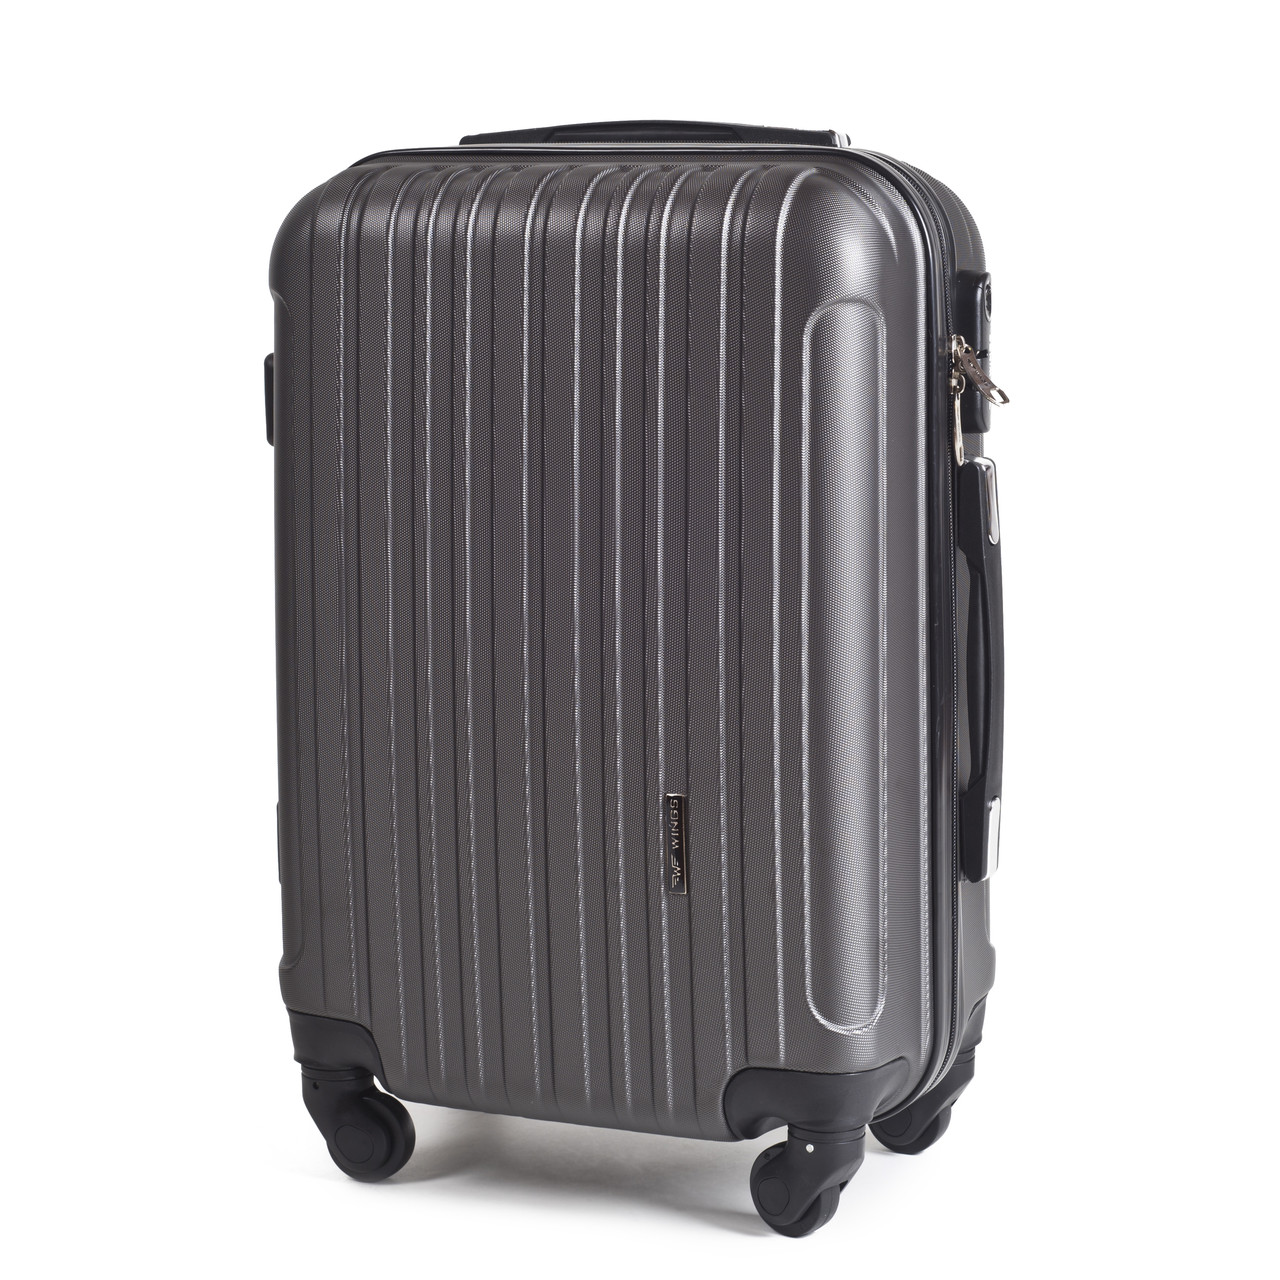 Малый пластиковый чемодан Wings 2011 на 4 колесах серый